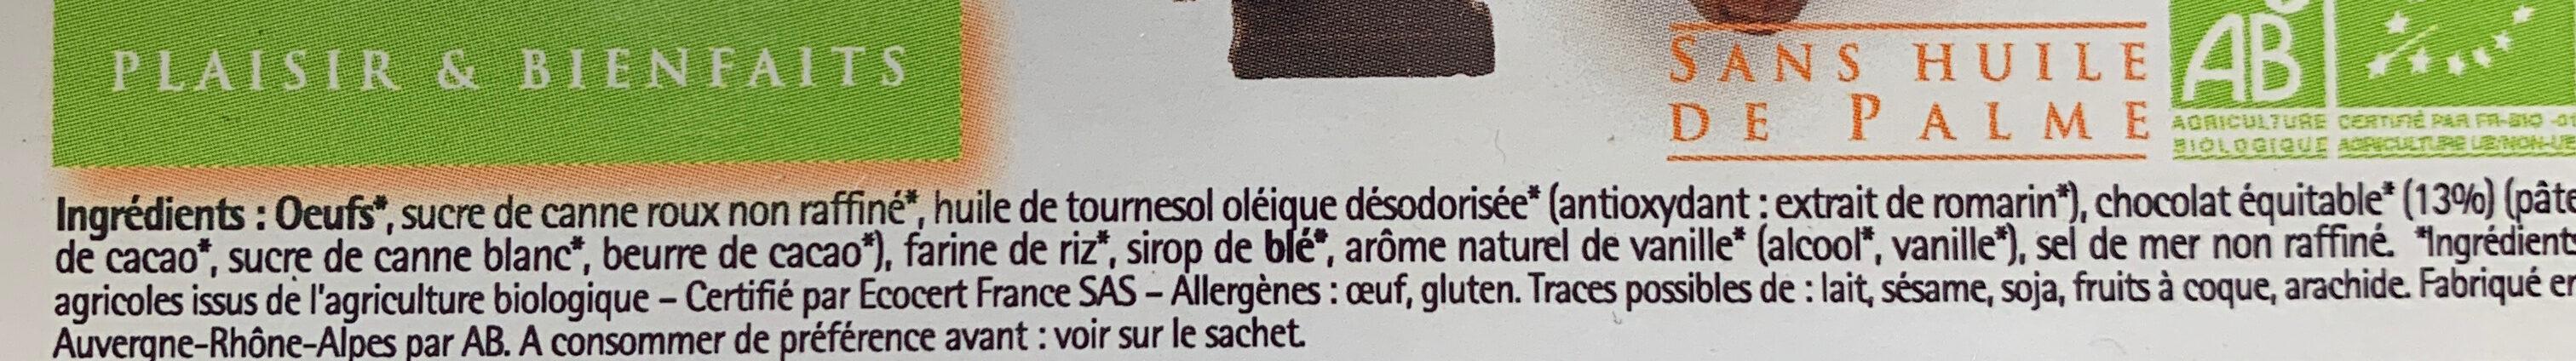 Fondant chocolat - Ingredients - fr